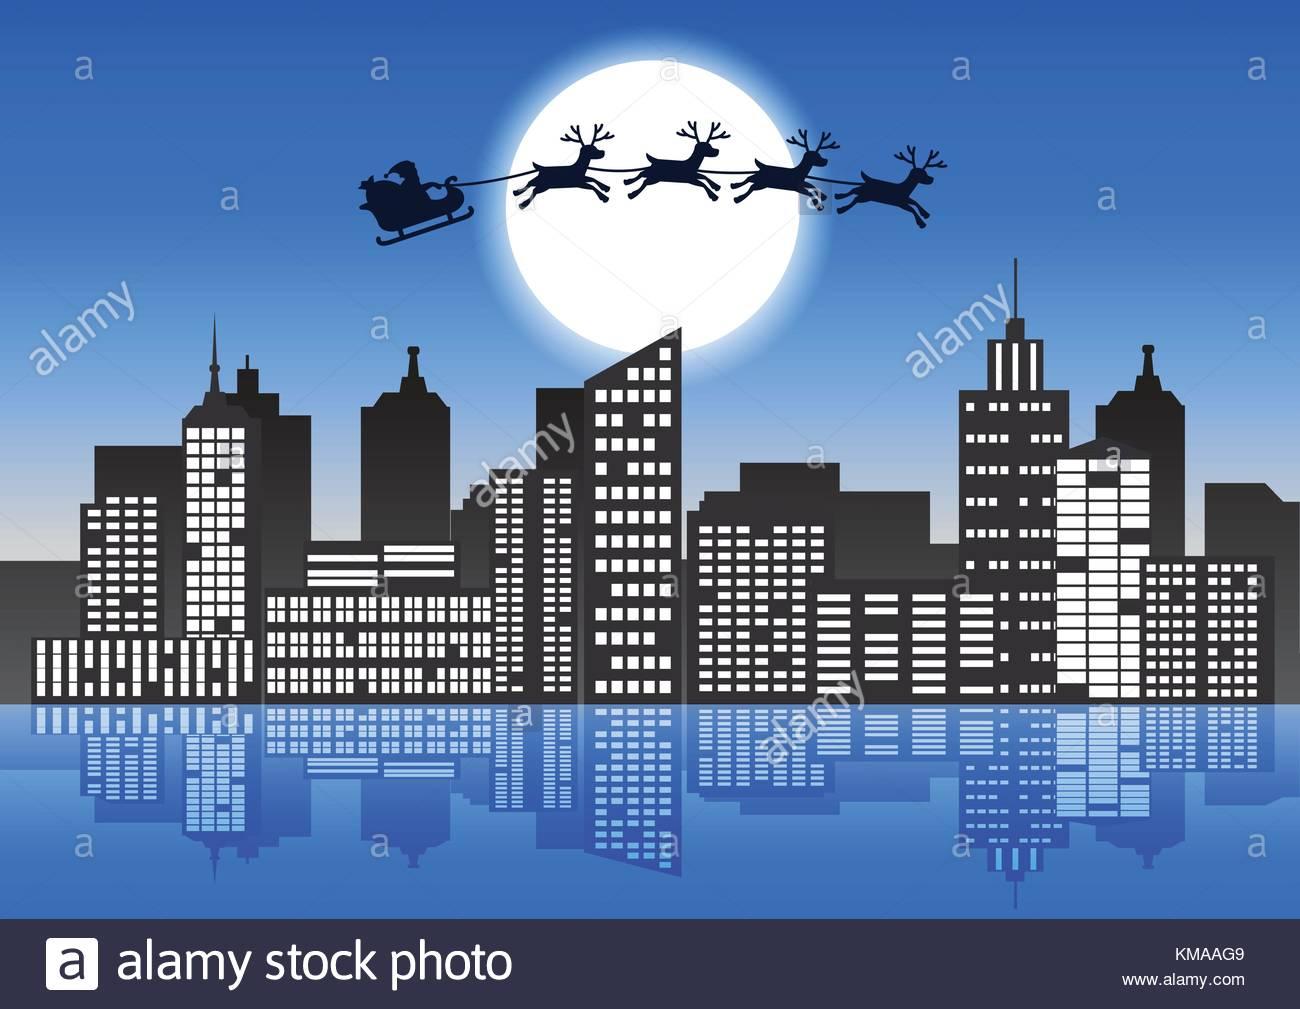 Reindeer sleigh fly stockfotos reindeer sleigh fly bilder alamy - Nasse fenster uber nacht ...